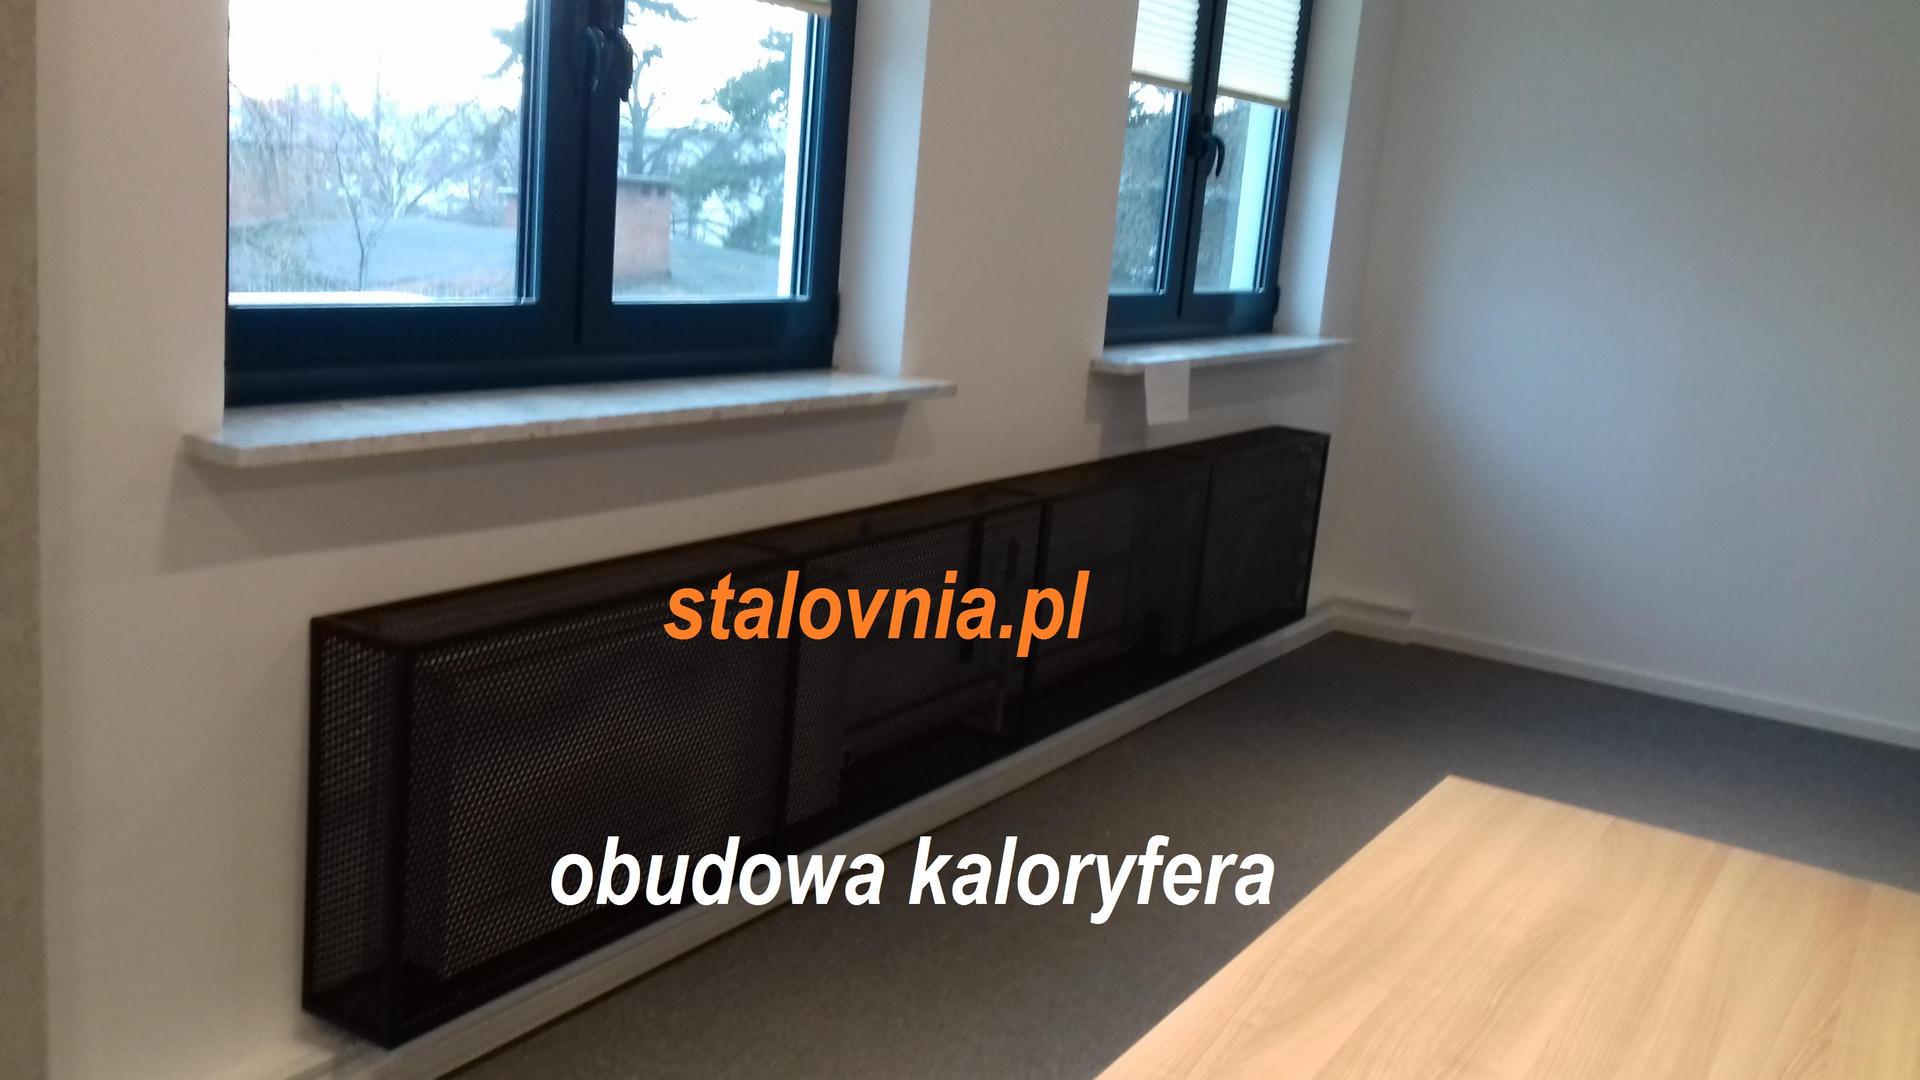 Obudowa kaloryfera w Warszawa.